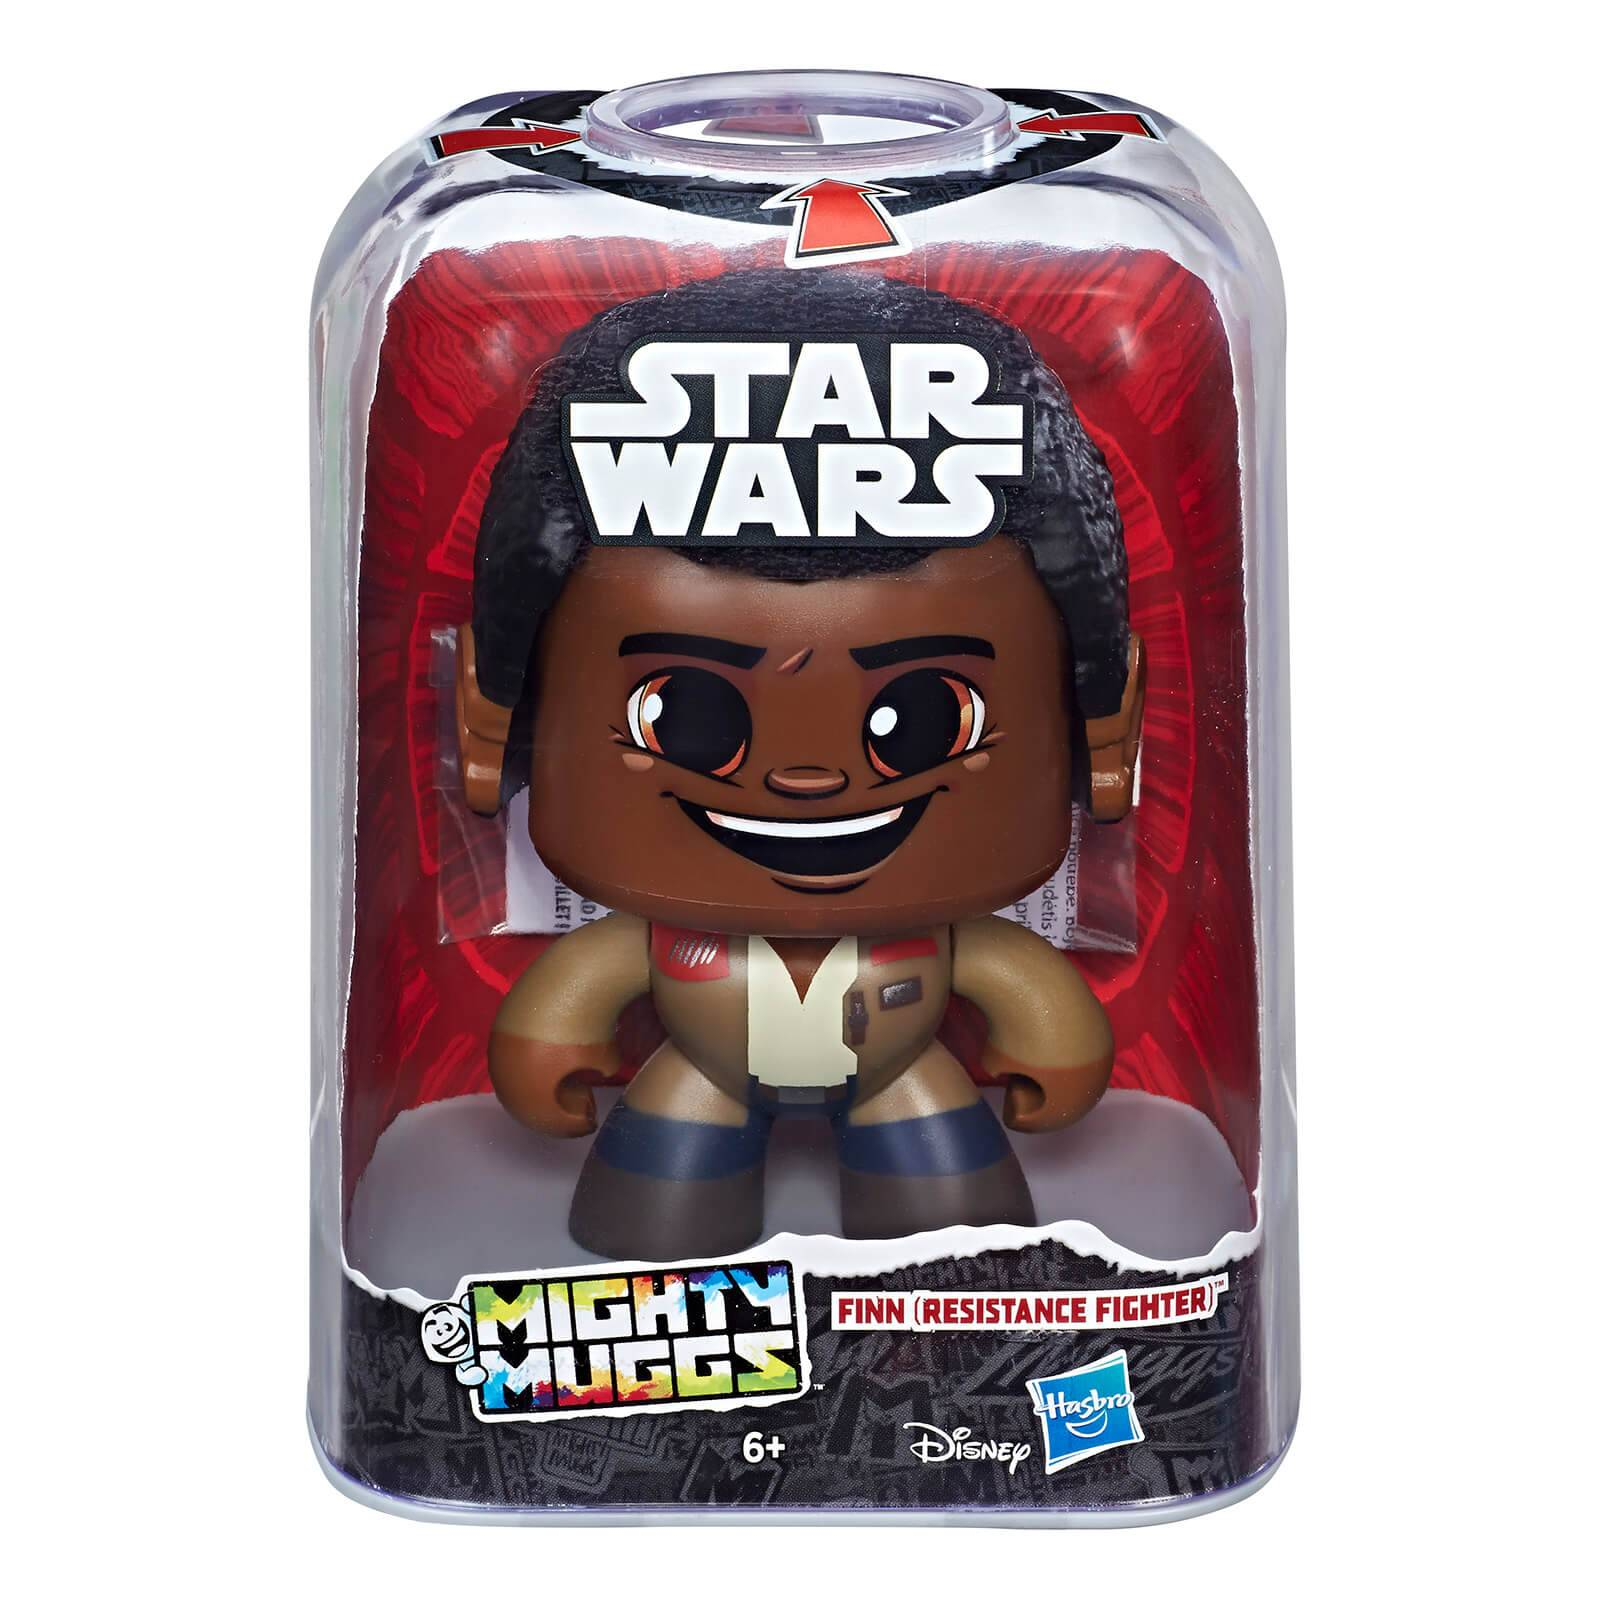 Mighty Muggs Star Wars Episode 7 Mighty Muggs - Finn